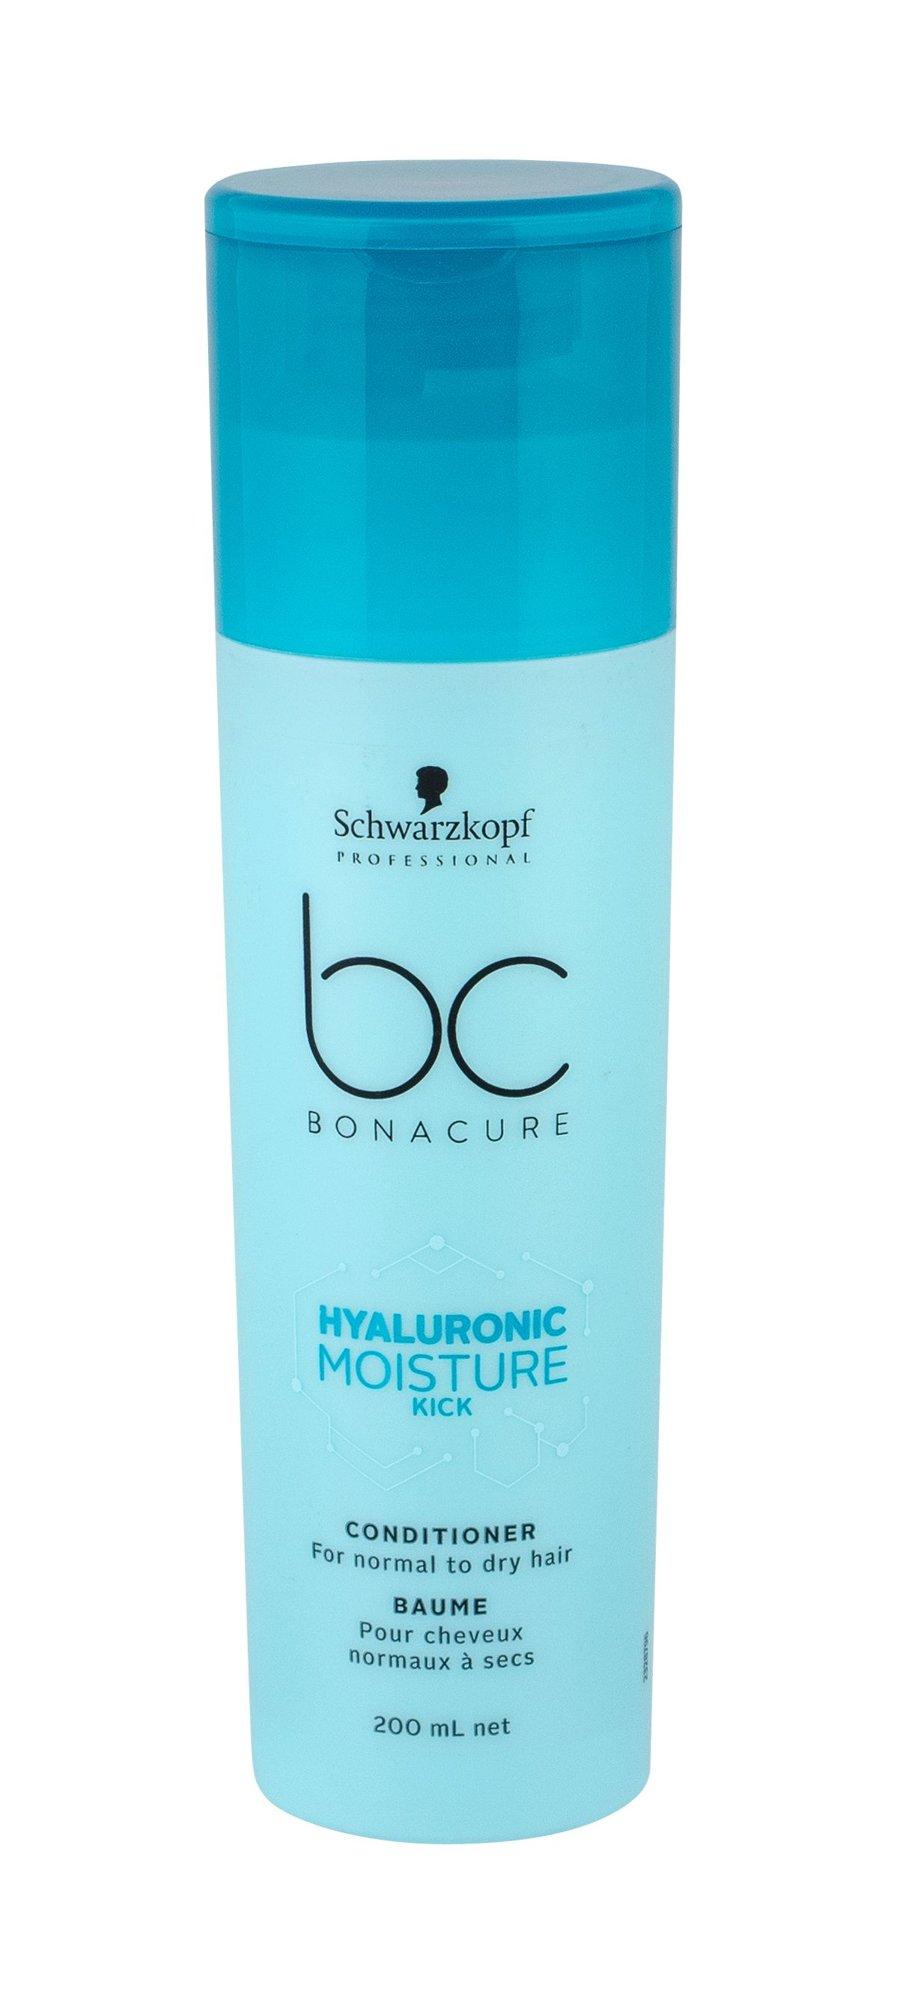 Schwarzkopf Professional BC Bonacure Hyaluronic Moisture Kick Conditioner 200ml